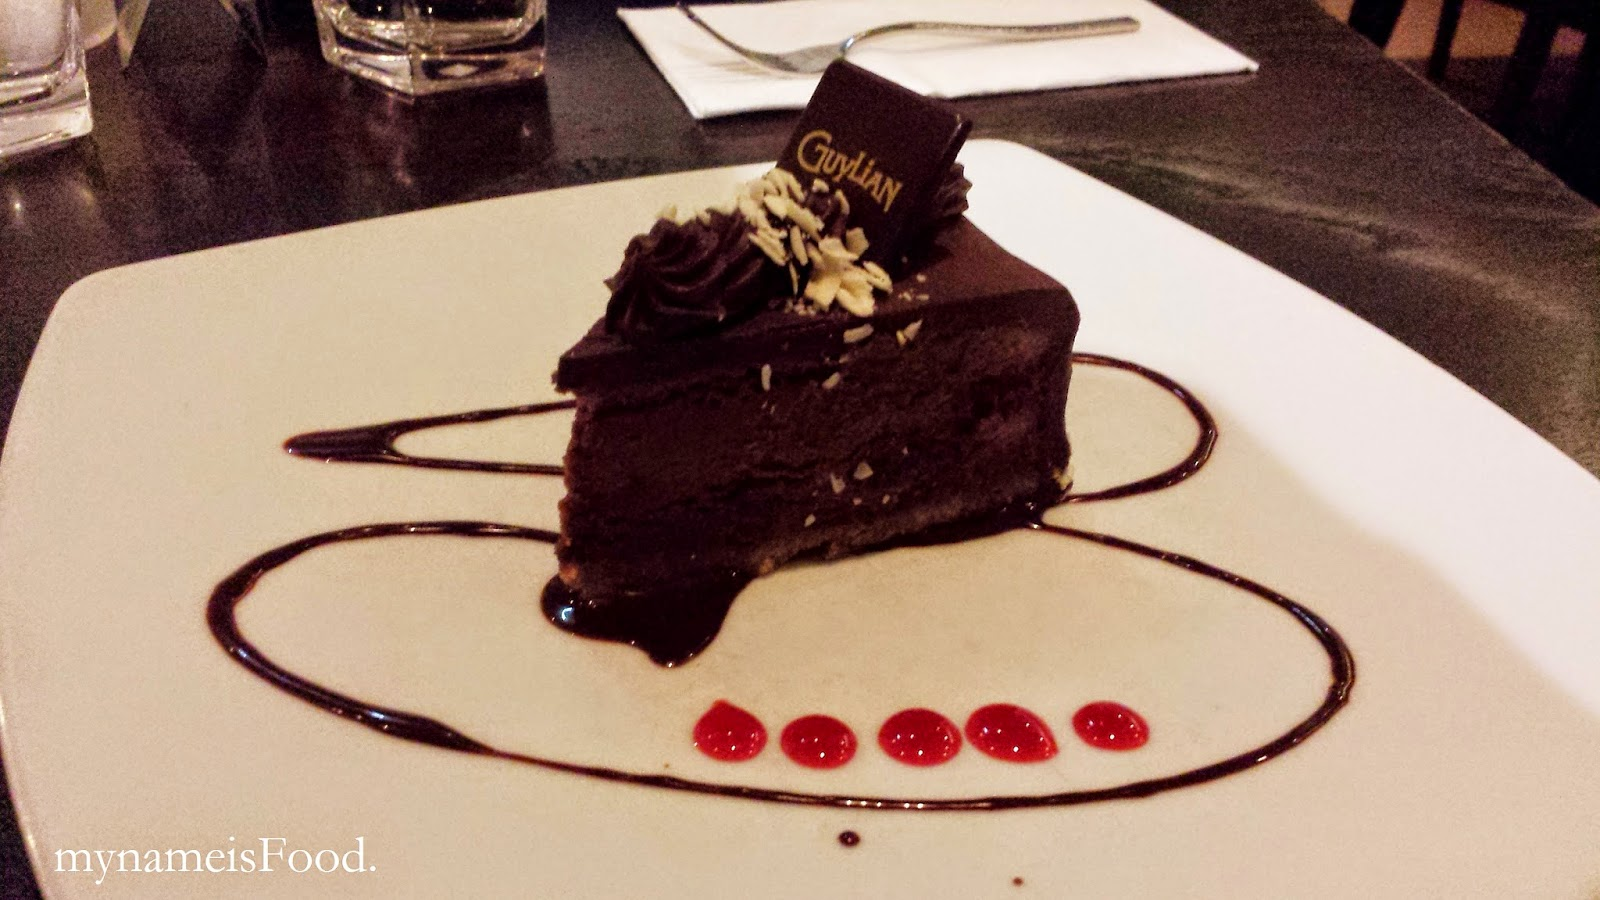 Guylian Belgian Chocolate Cafe, George St, The Rocks, Sydney - my ...